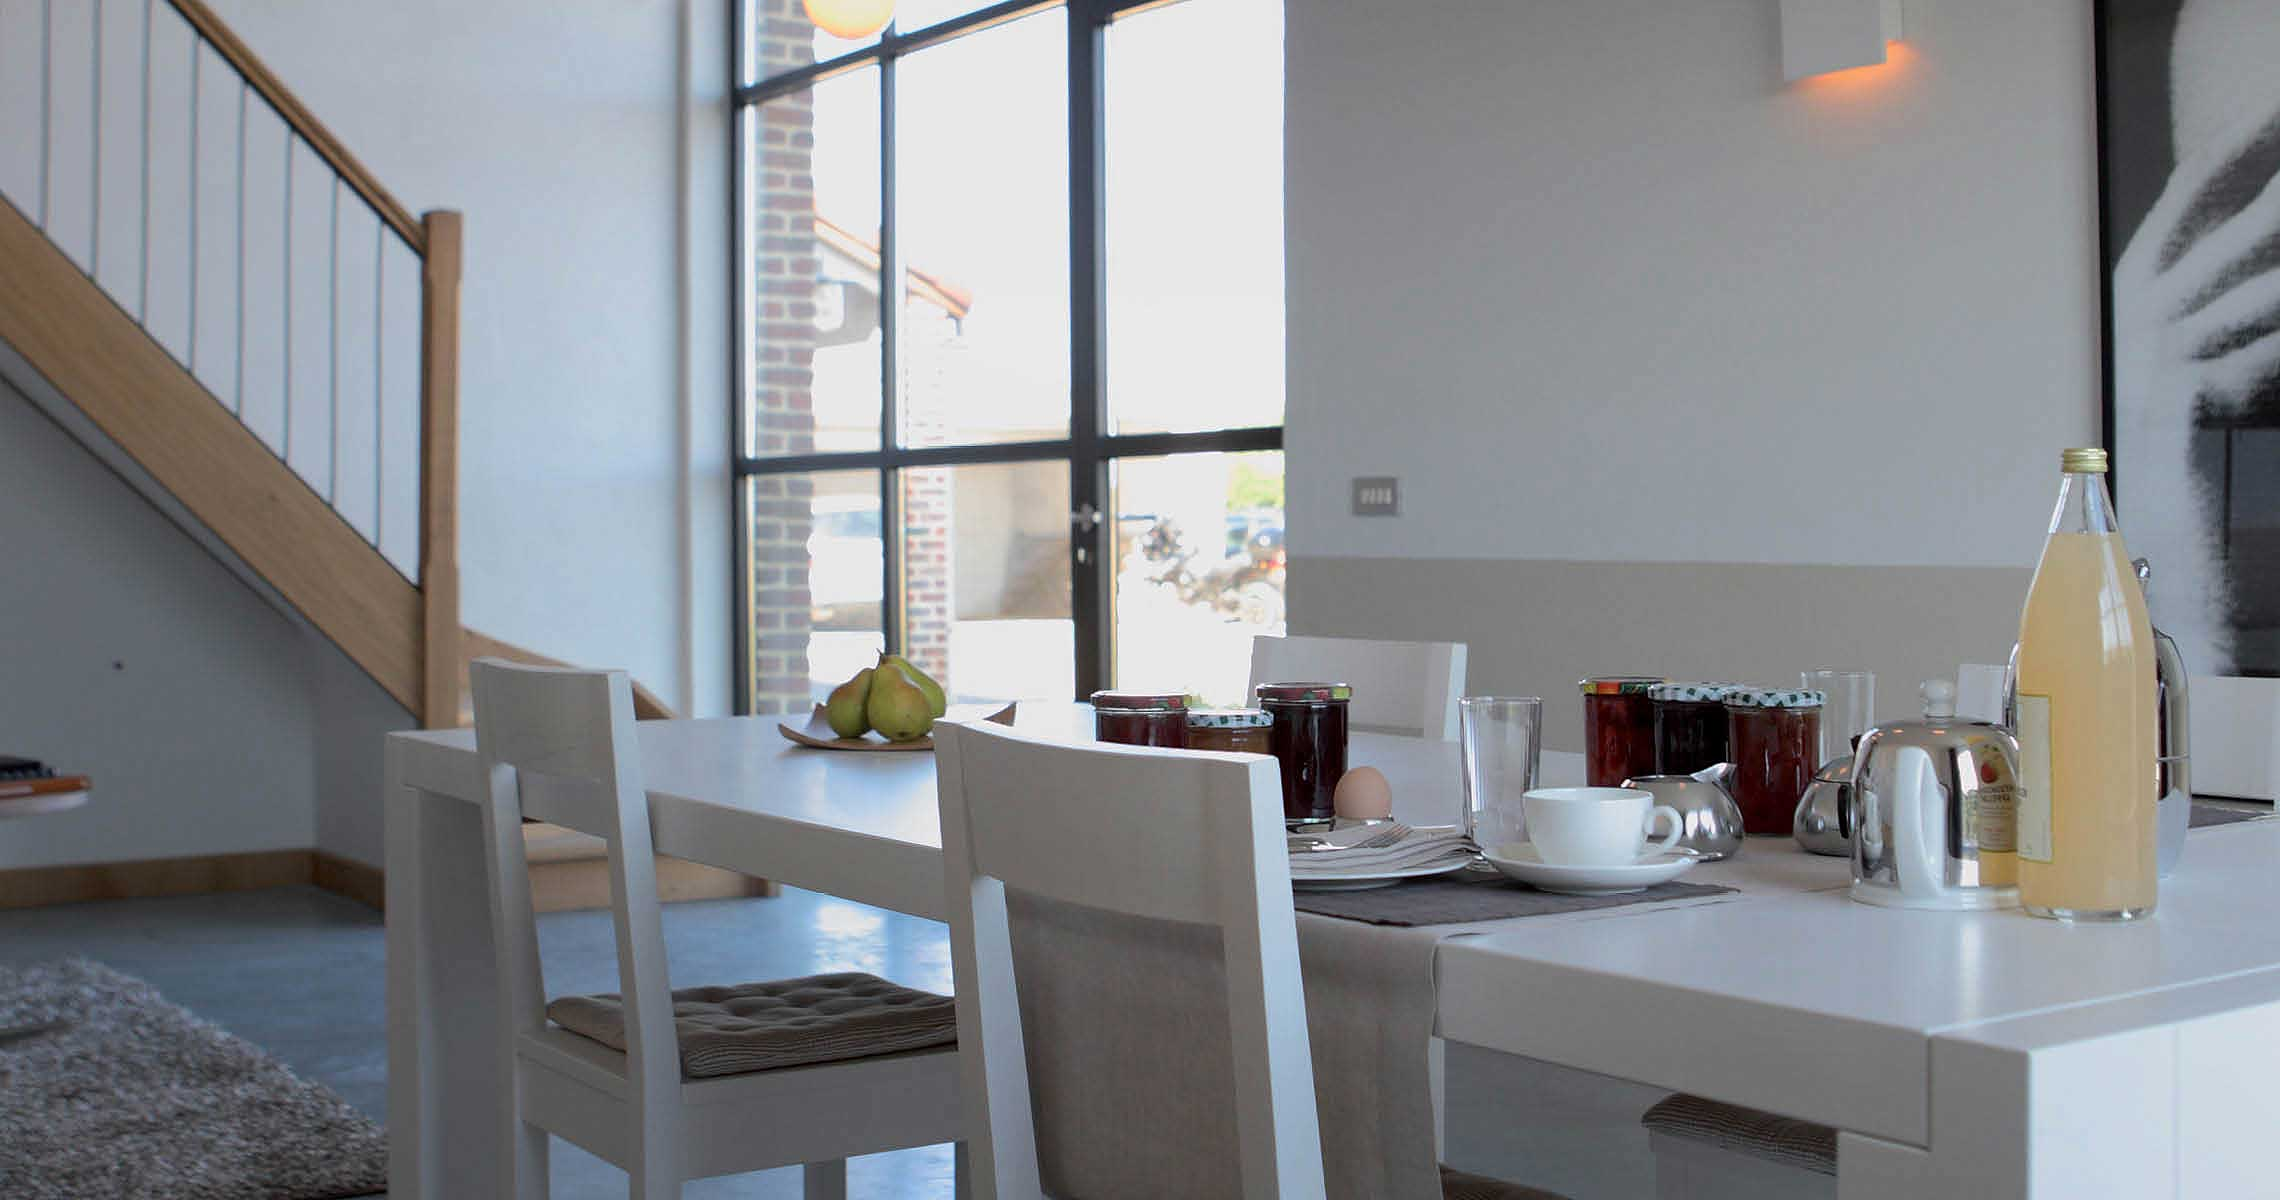 Breakfast table stairs and large window B&B Het Rooj